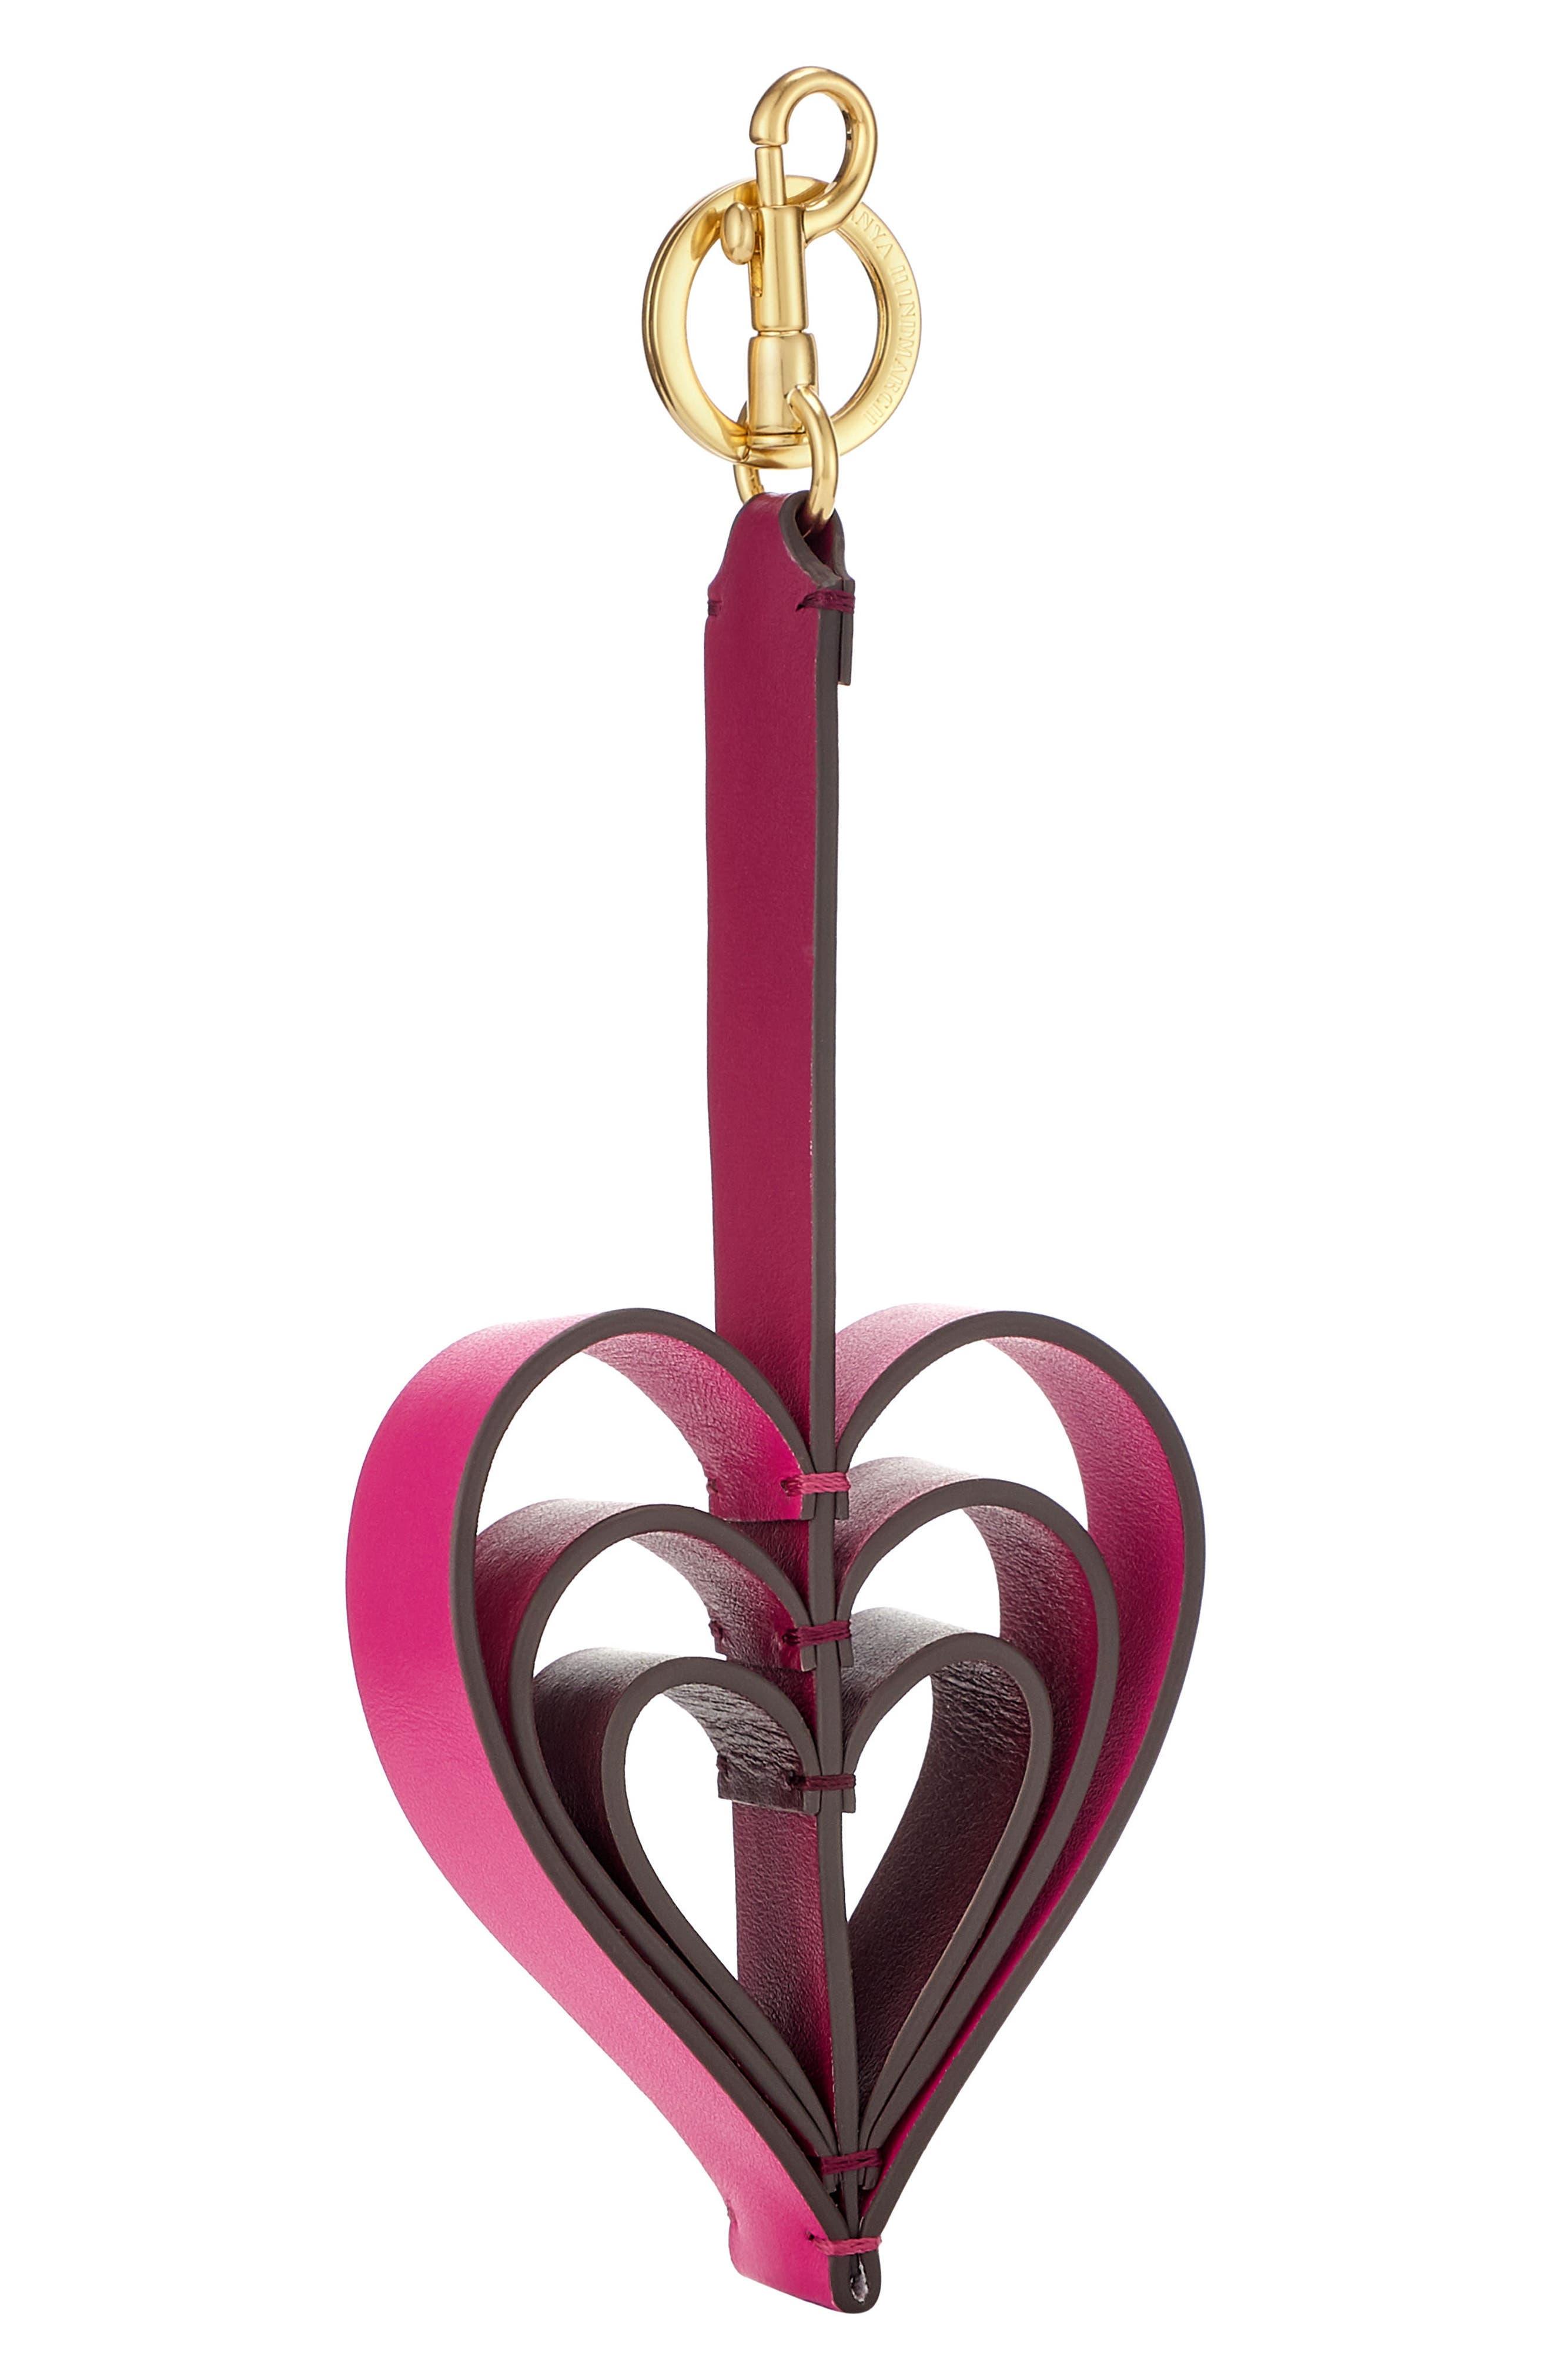 ANYA HINDMARCH Tassel Heart Circus Leather Bag Charm